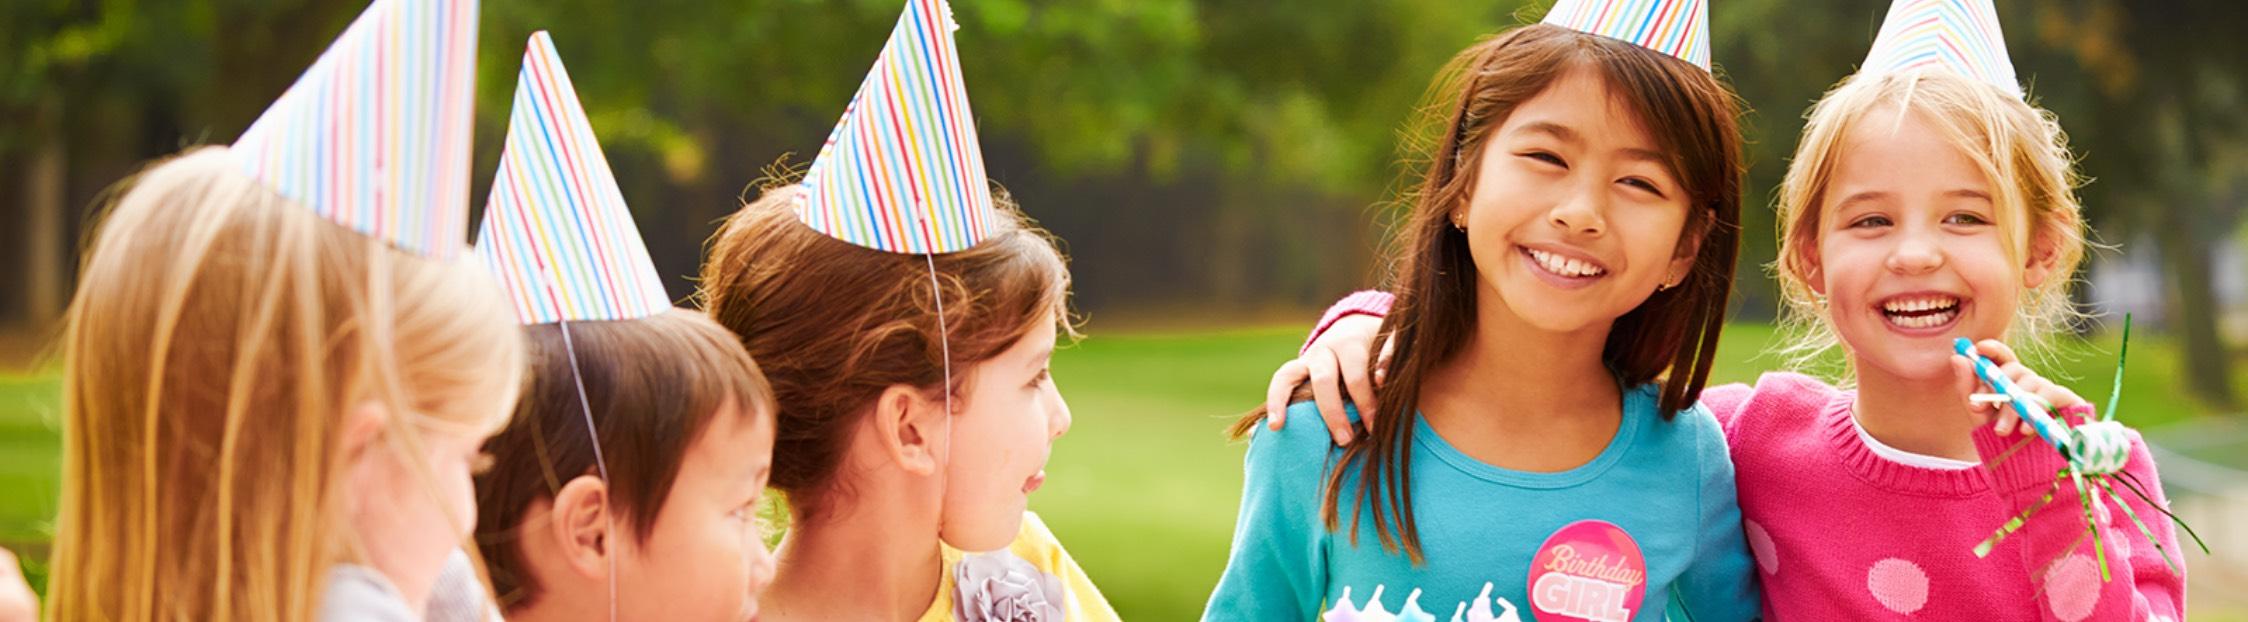 Green Meadows Petting Farm Birthday Parties Maryland Location